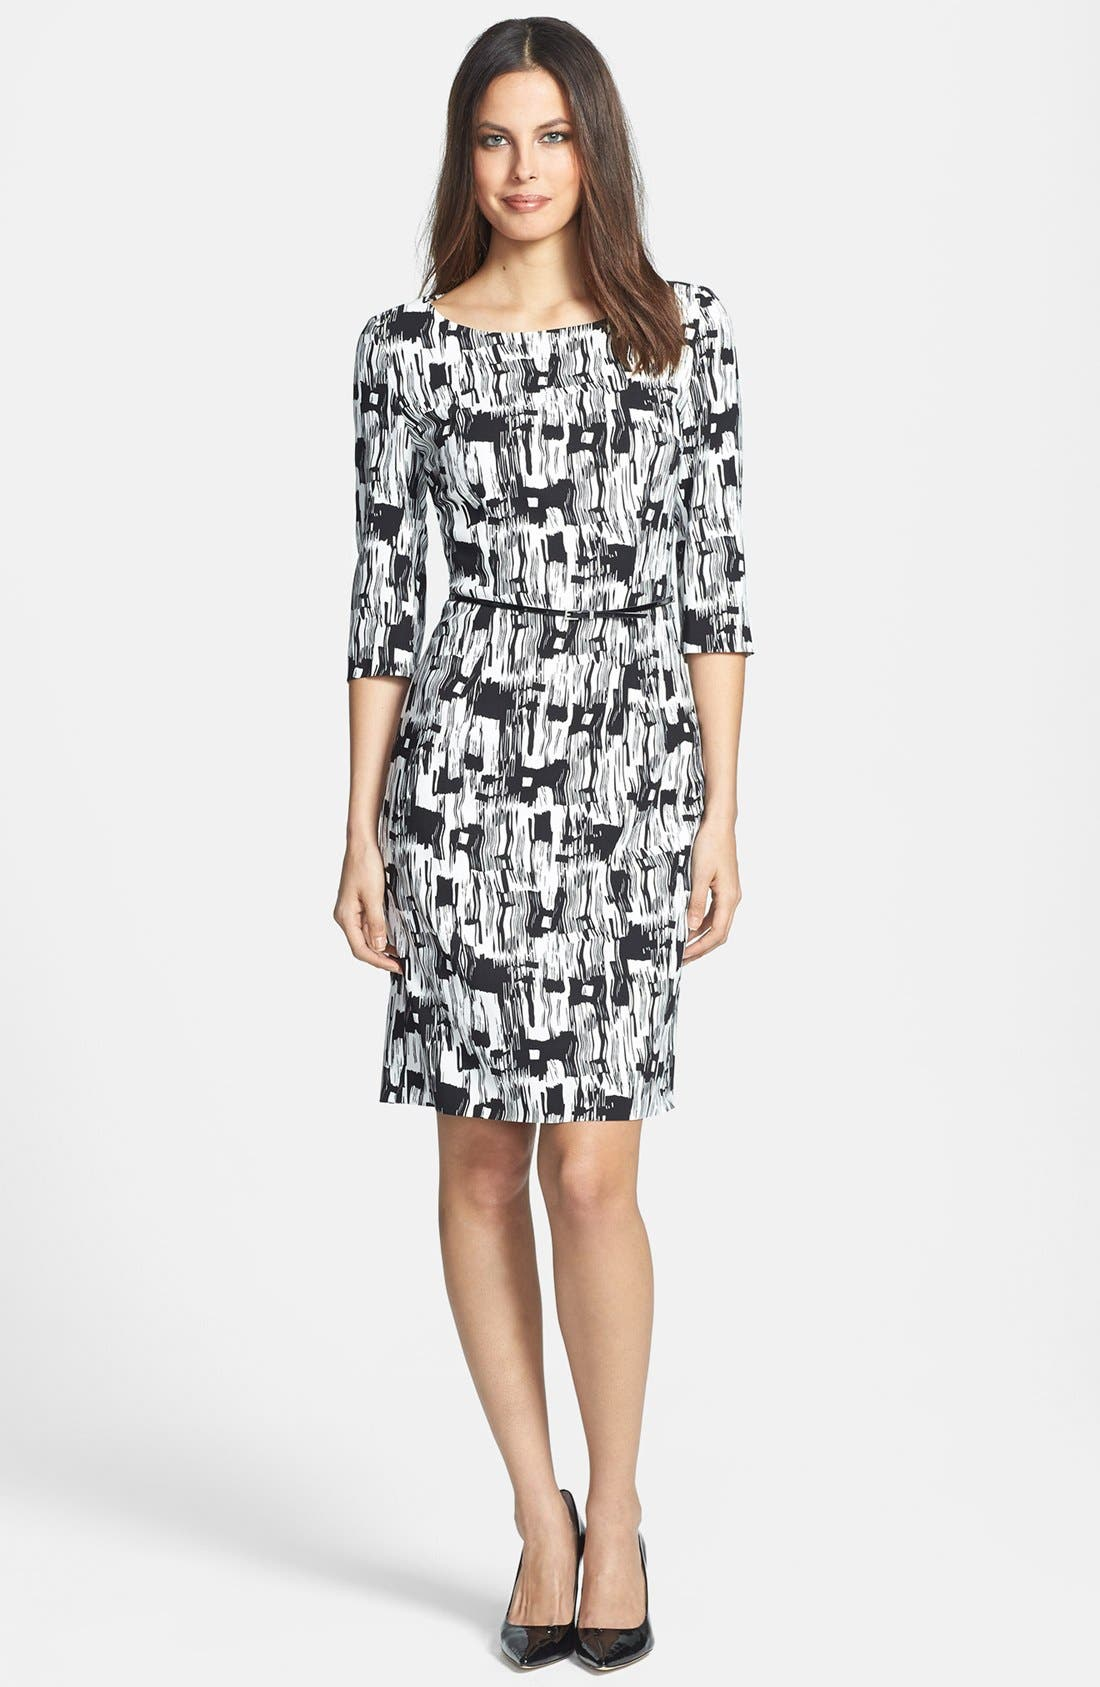 Alternate Image 1 Selected - BOSS HUGO BOSS 'Dinomi' Print Stretch Crepe Dress